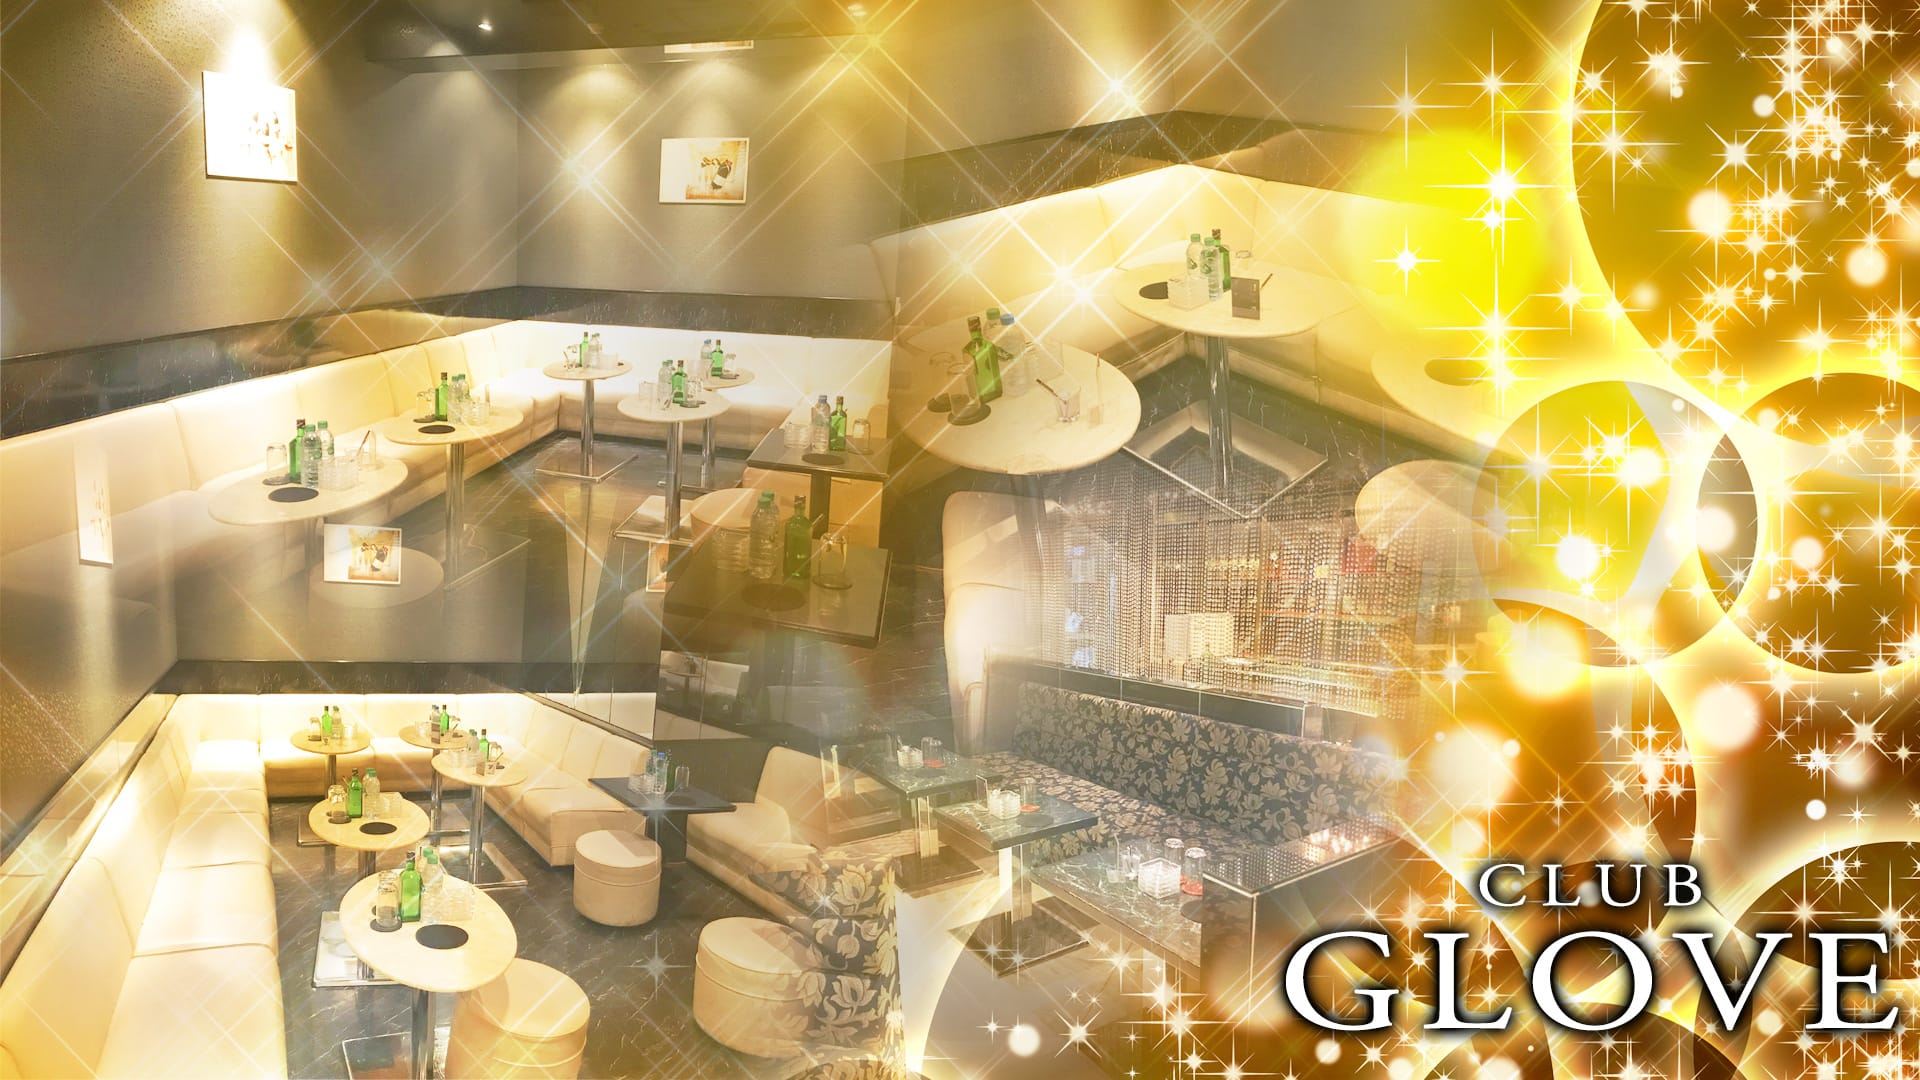 CLUB GLOVE ーグローブー 相模原キャバクラ TOP画像